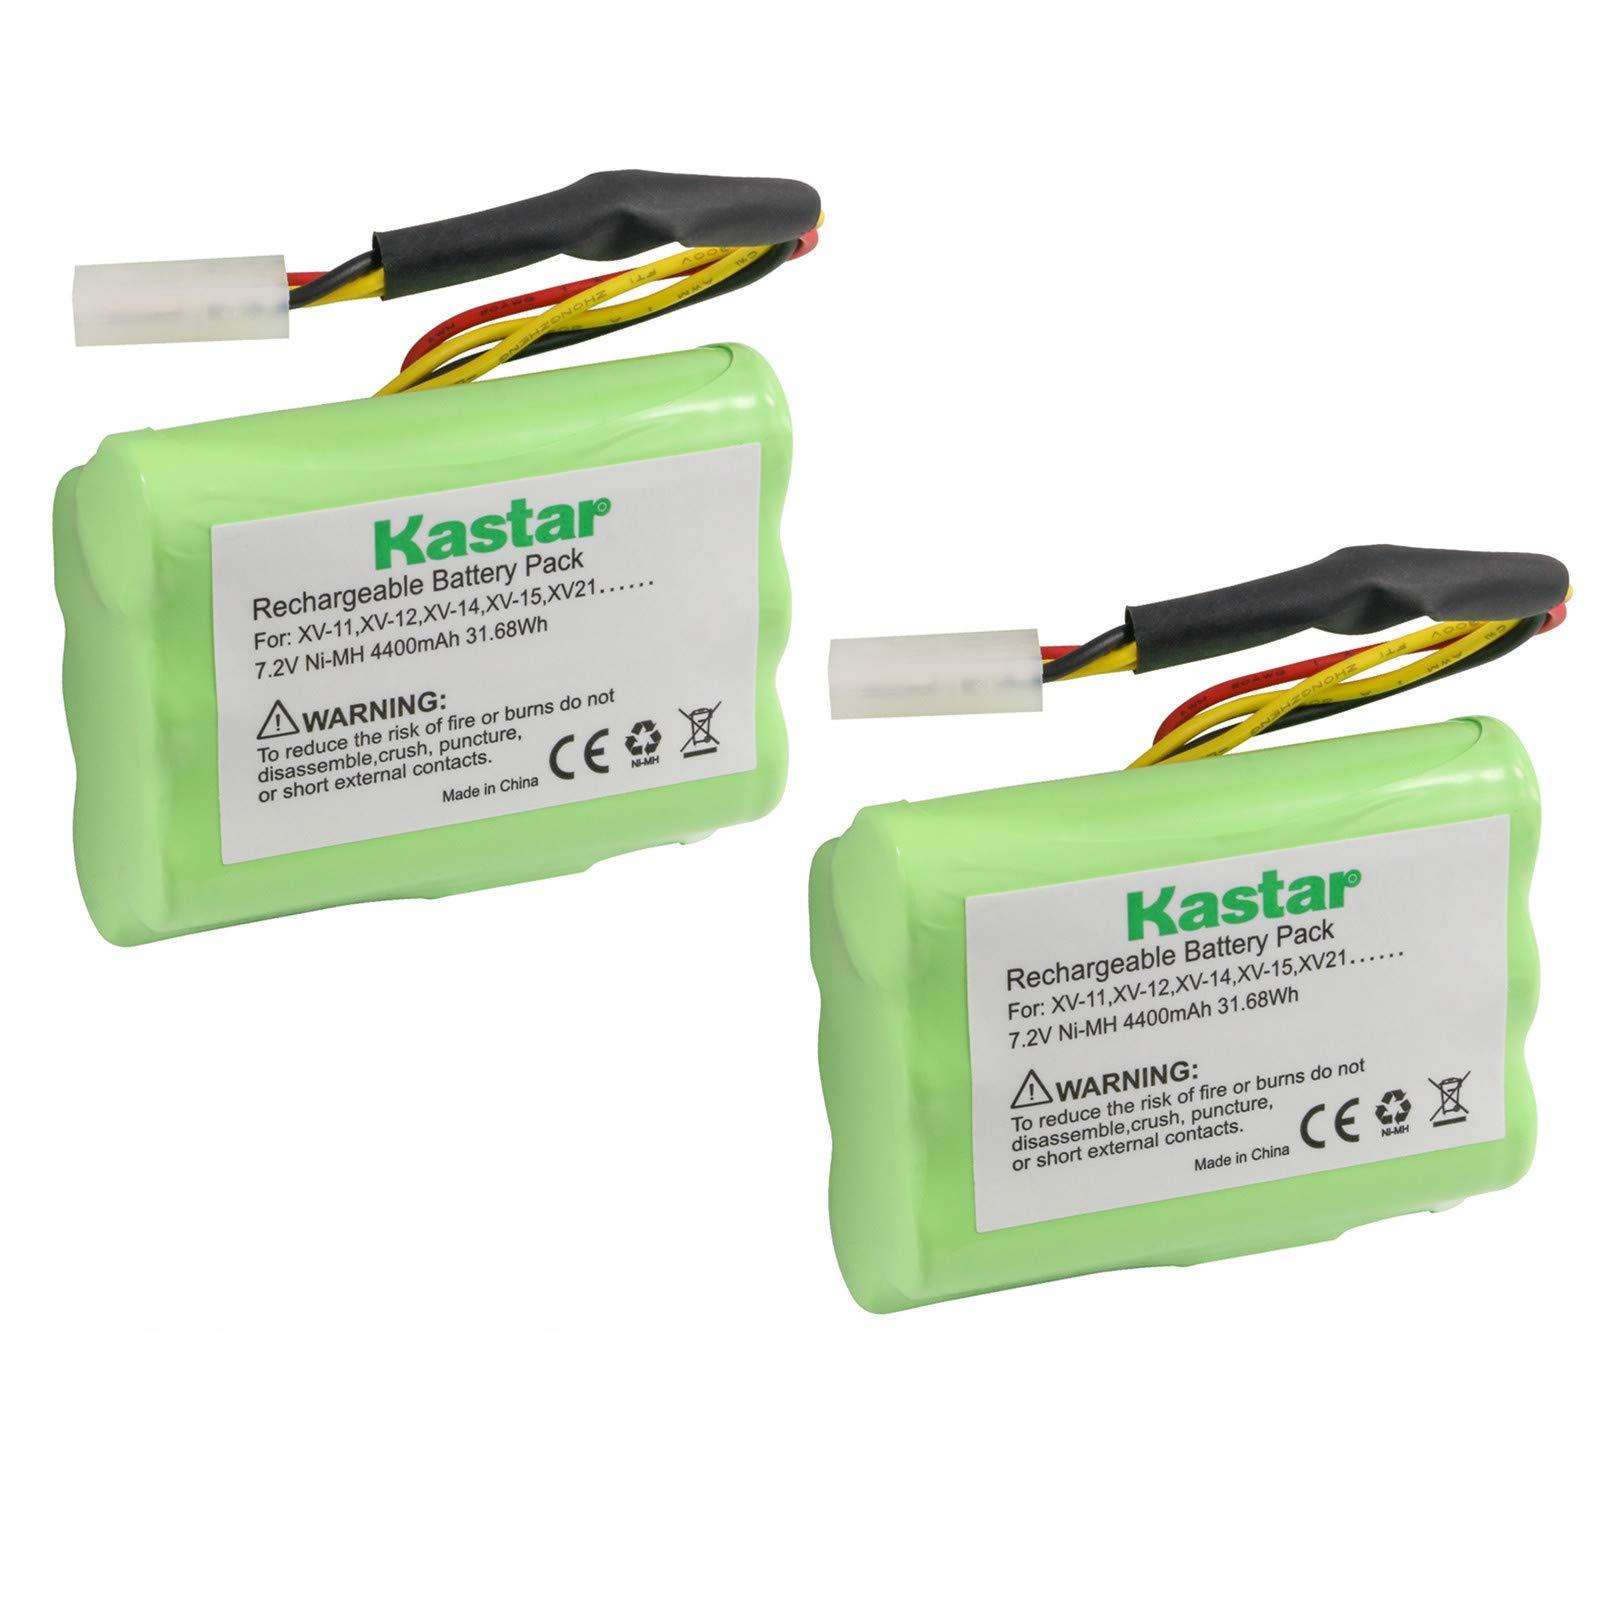 Kastar XV11 Battery (2 Pack), Ni-MH 7.2V 4400mAh, Replacement for Neato XV-11 XV-12 XV-14 XV-15 XV-21 XV-25, XV Essential, XV Signature Pro Robotic Vacuum Cleaners Neato Battery 945-0005 205-0001